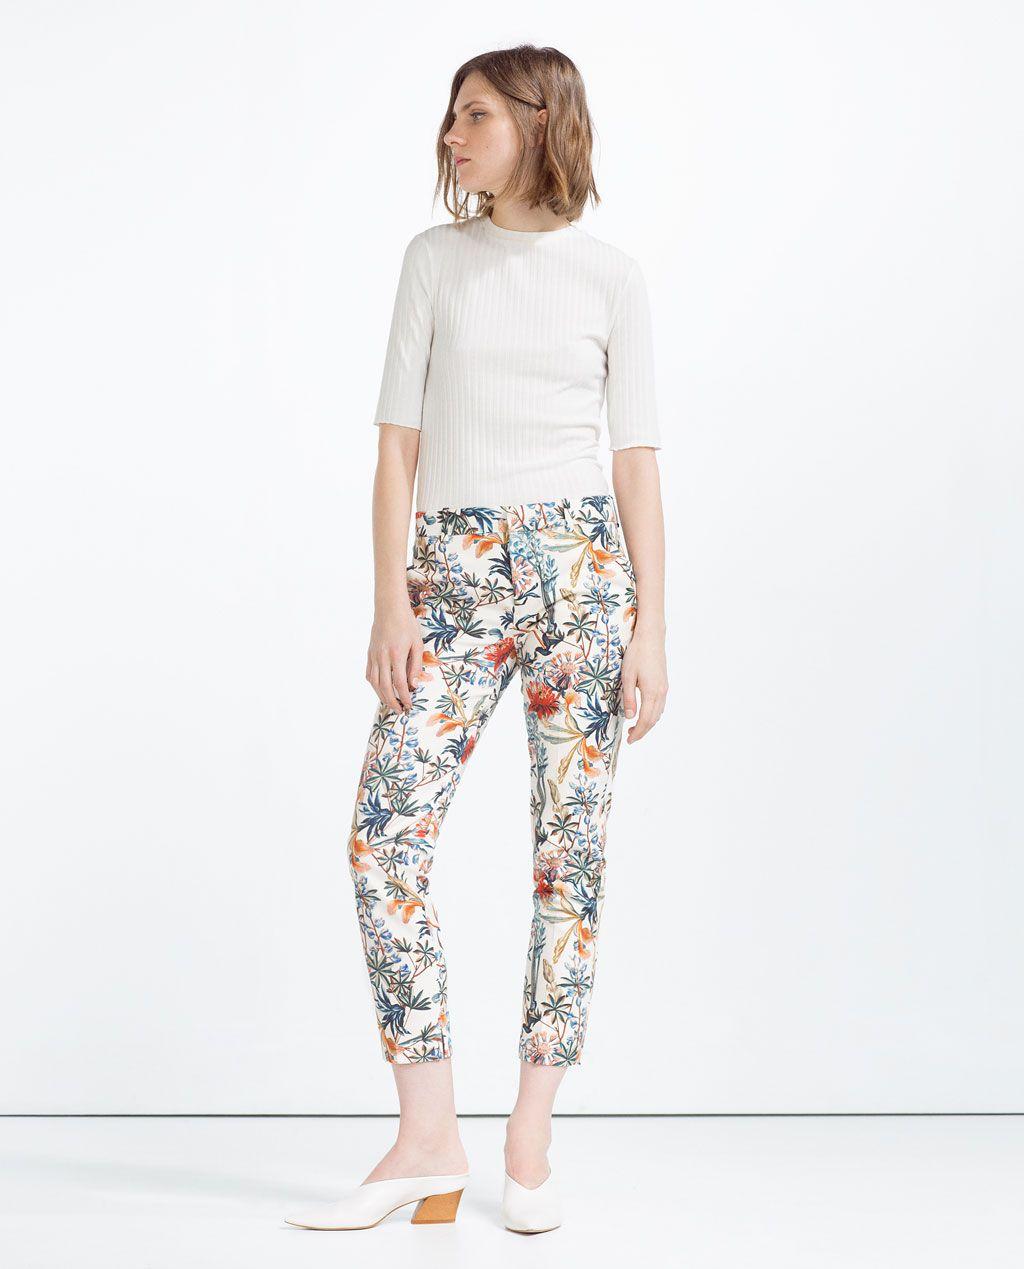 zara femme pantalon imprim robes fleuries pinterest mariage pantalons et printemps. Black Bedroom Furniture Sets. Home Design Ideas